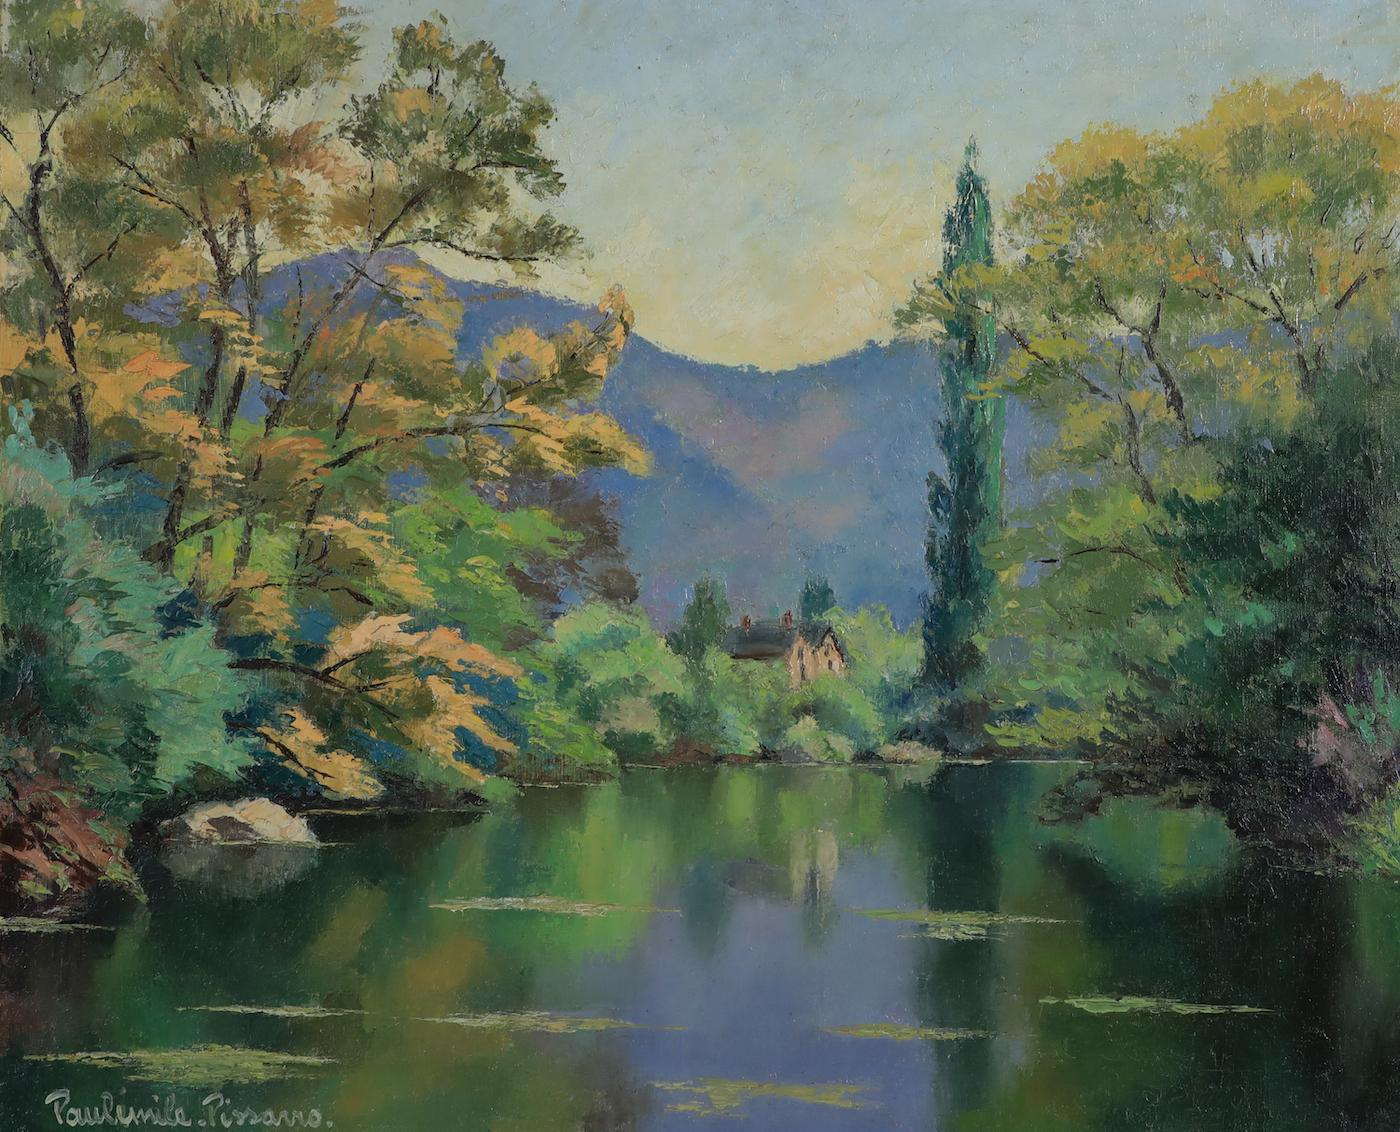 Printemps by Paulémile Pissarro - Post-Impressionist oil painting